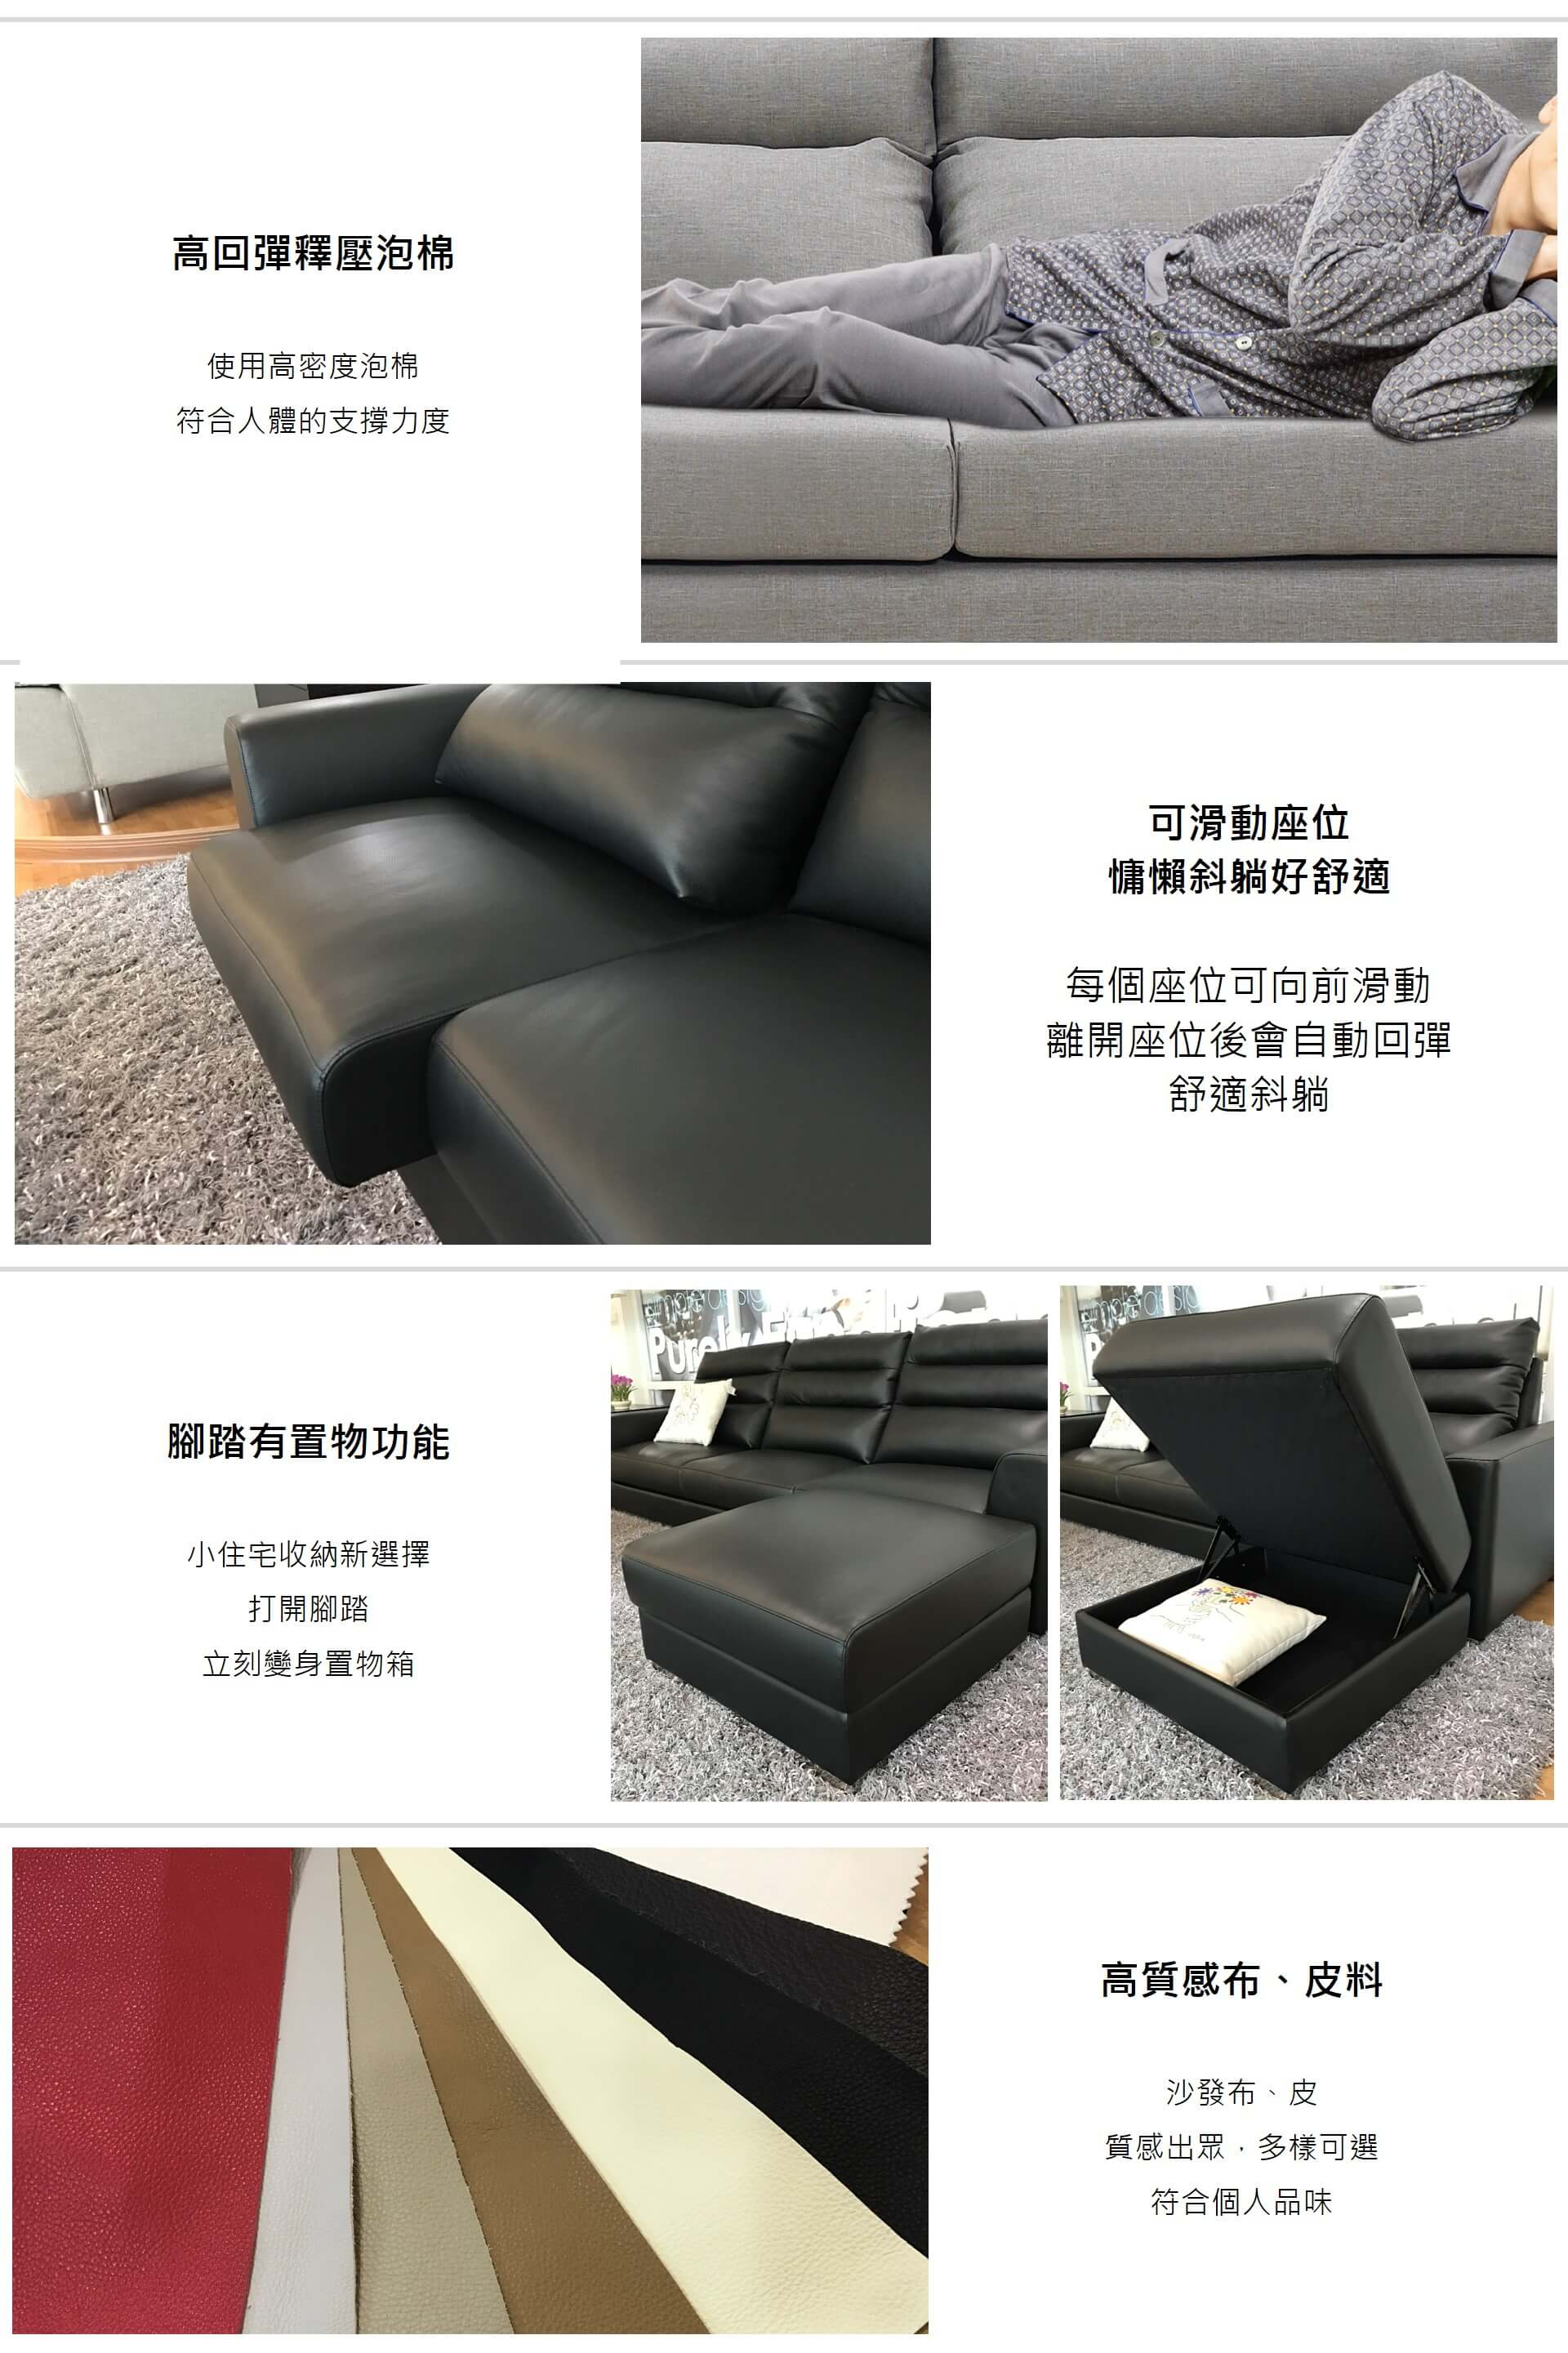 L i order for Edit 03 sofa